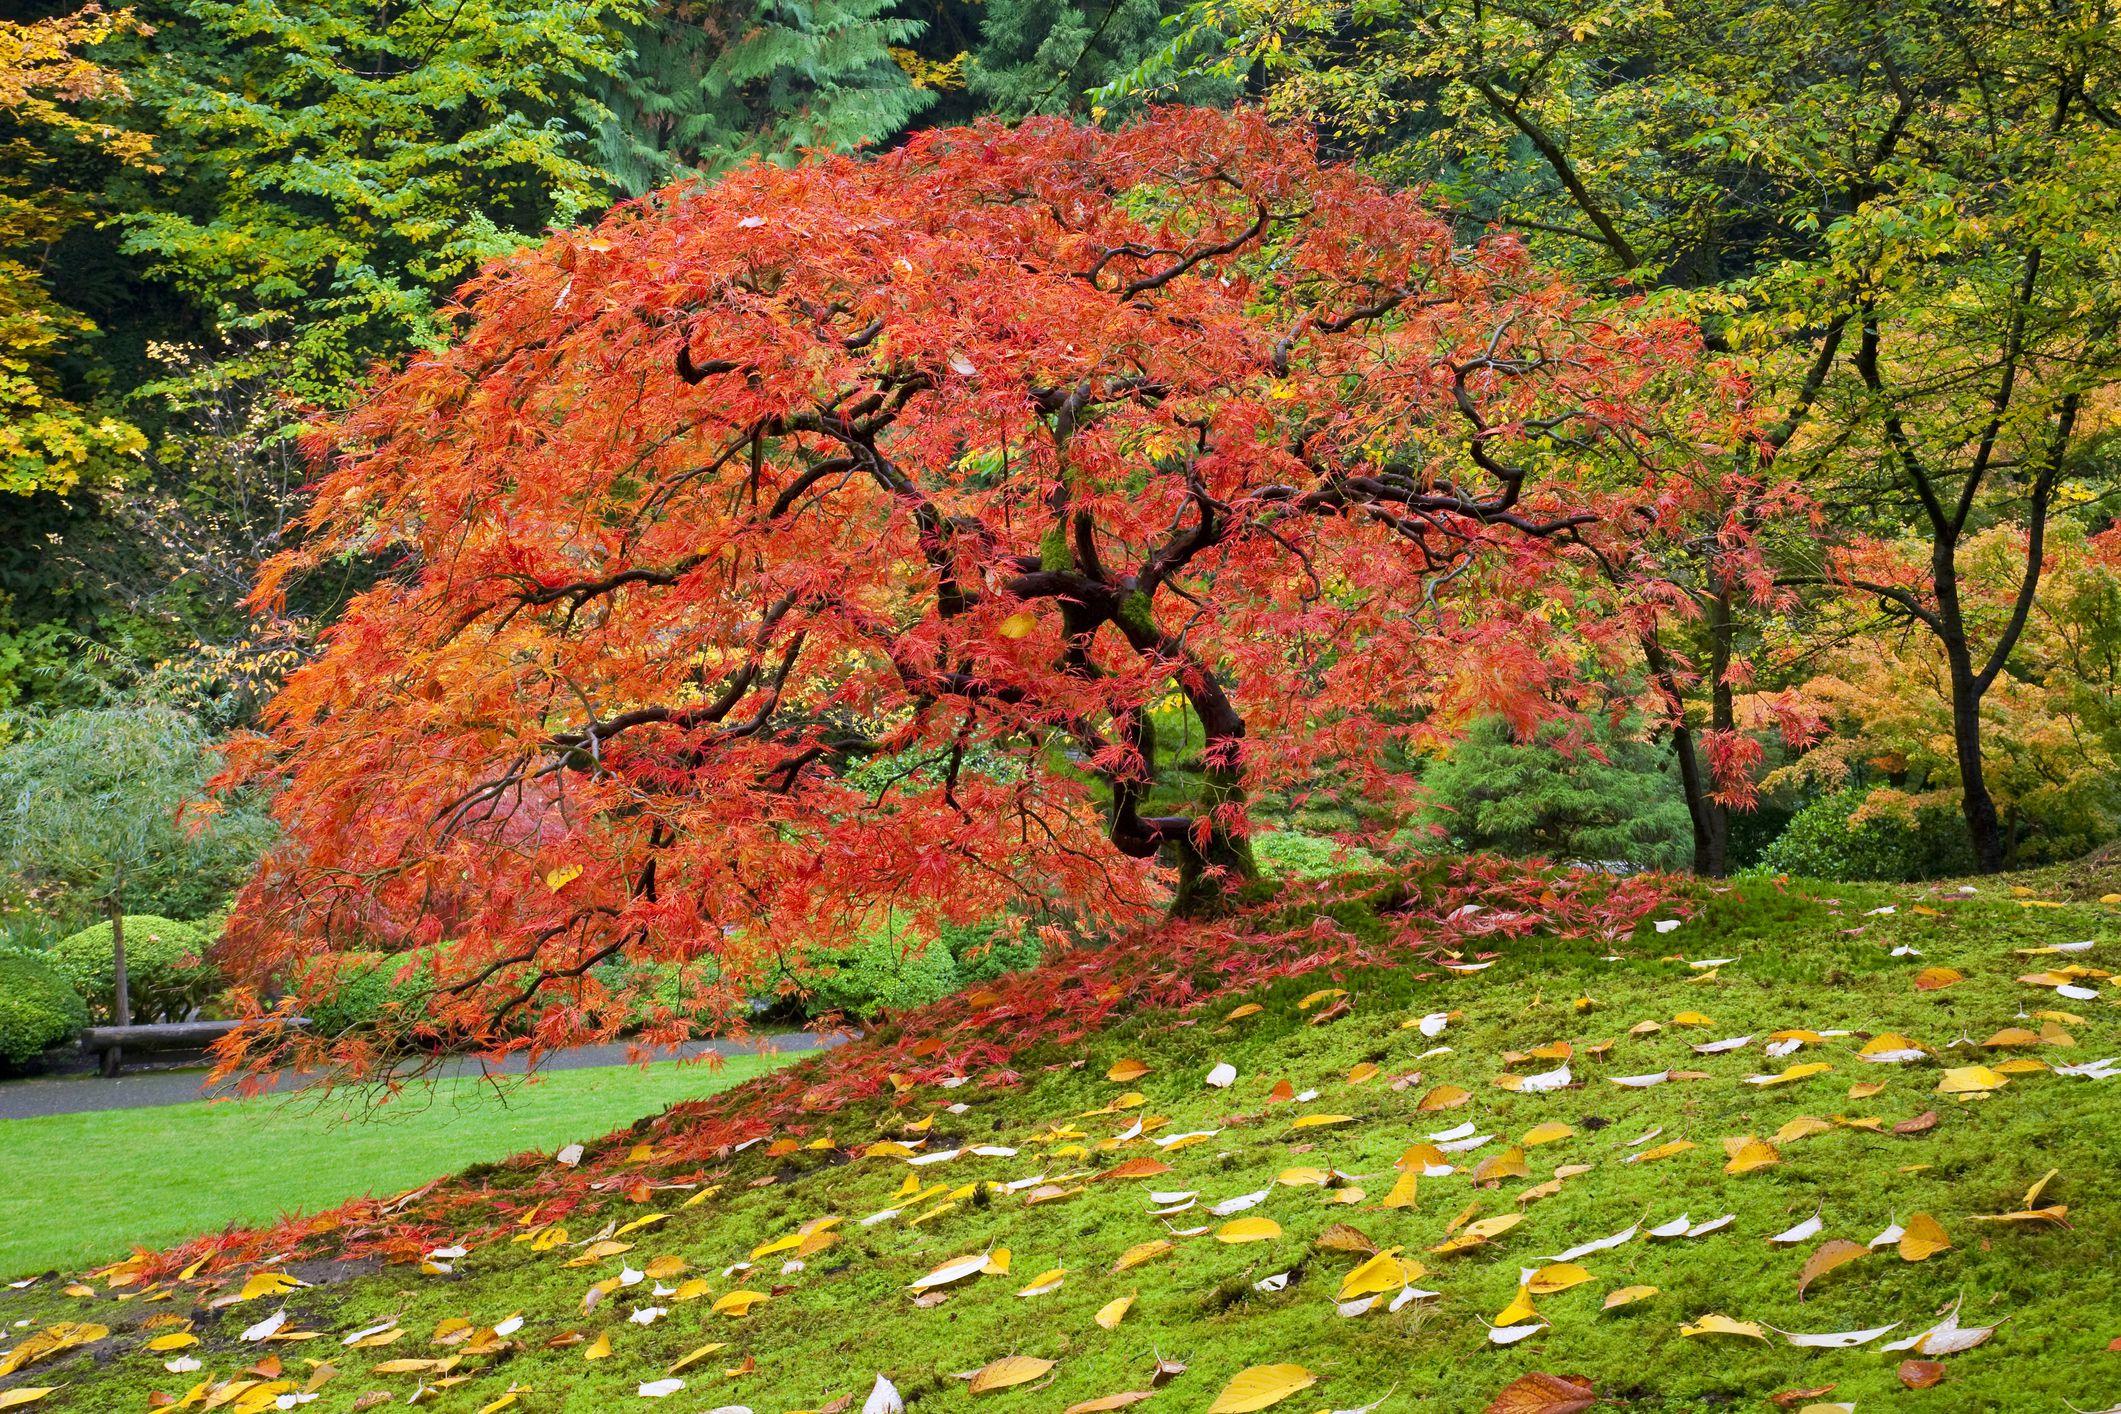 A Japanese maple in a garden